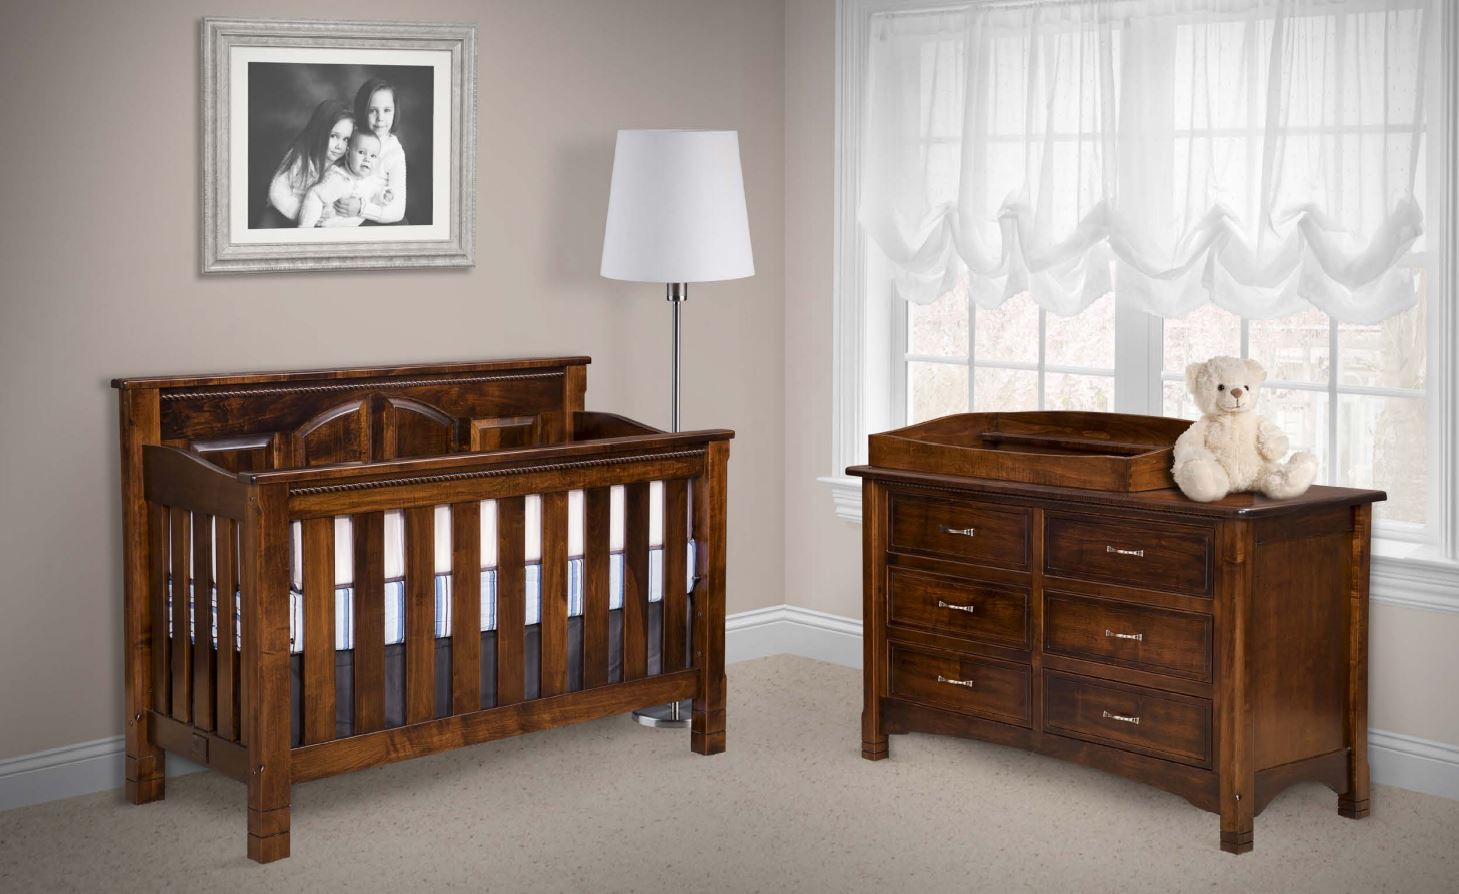 Westlake Crib Collection